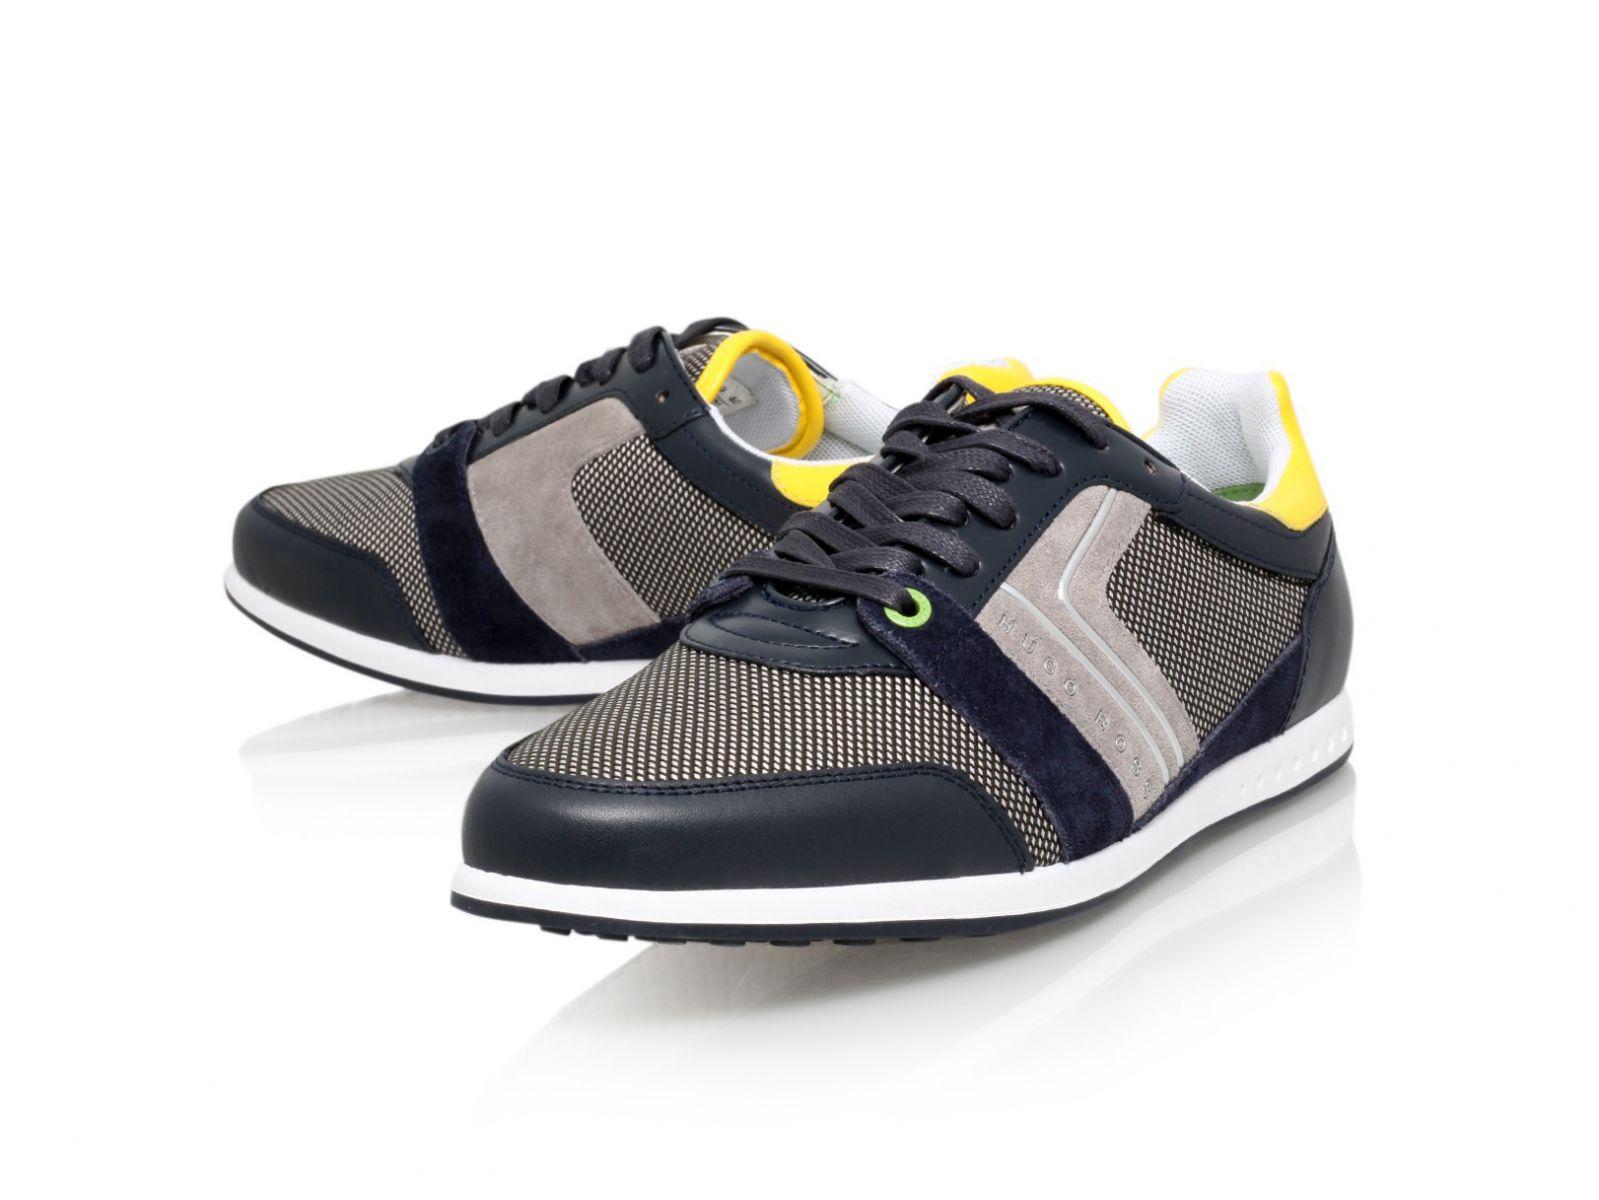 chaussures sport chic homme. Black Bedroom Furniture Sets. Home Design Ideas